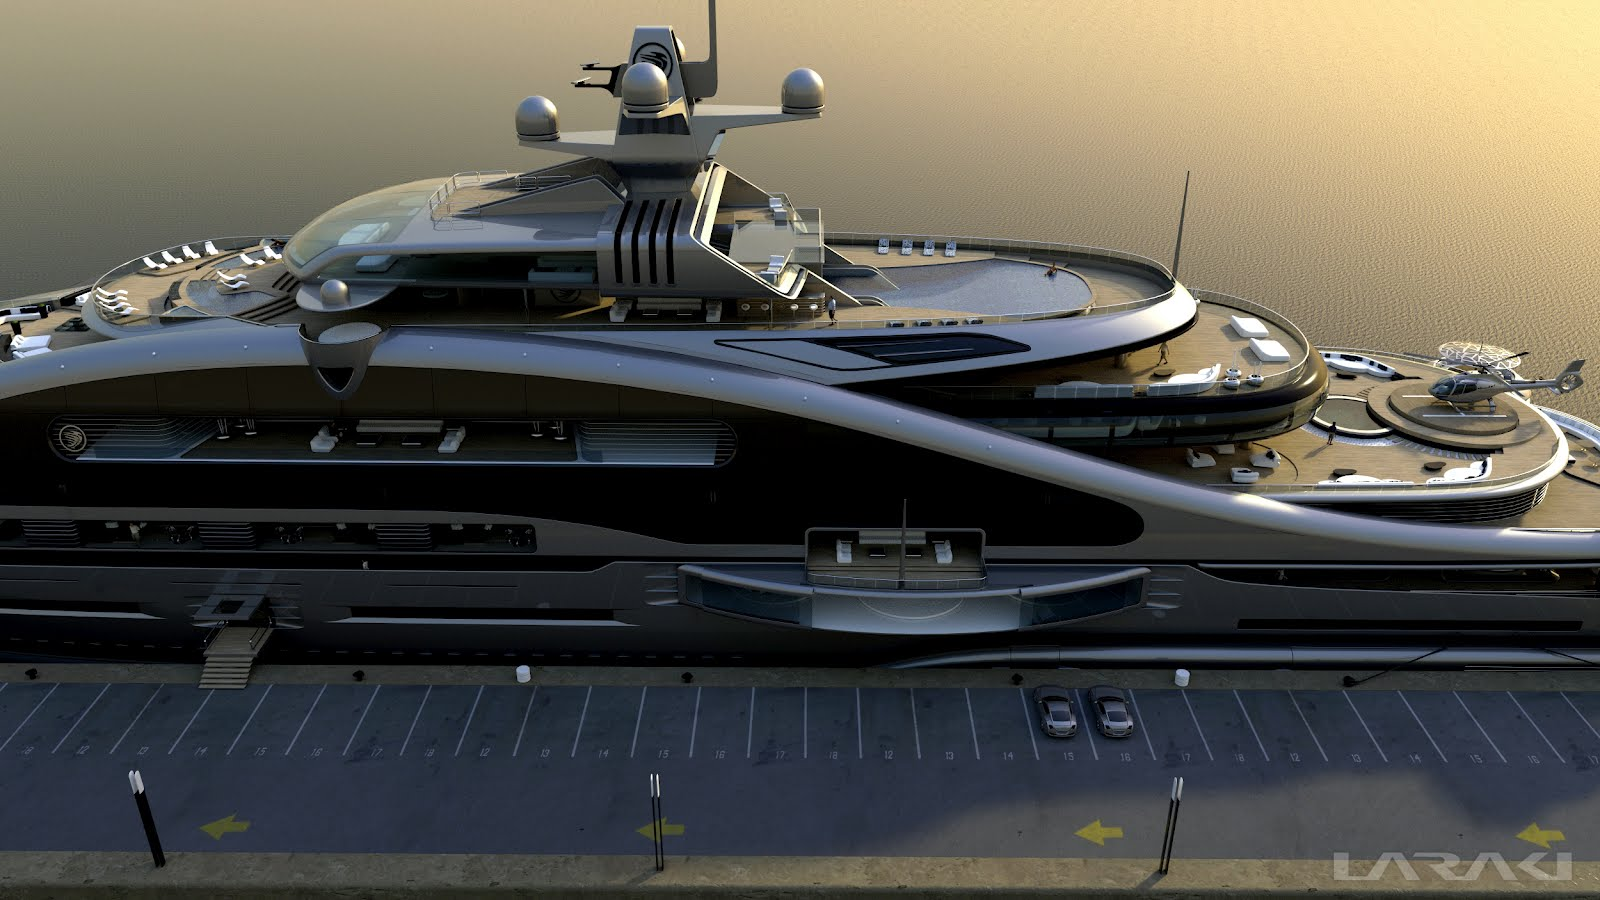 Megayacht global laraki yacht designs impressive 163m for Yacht dekoration